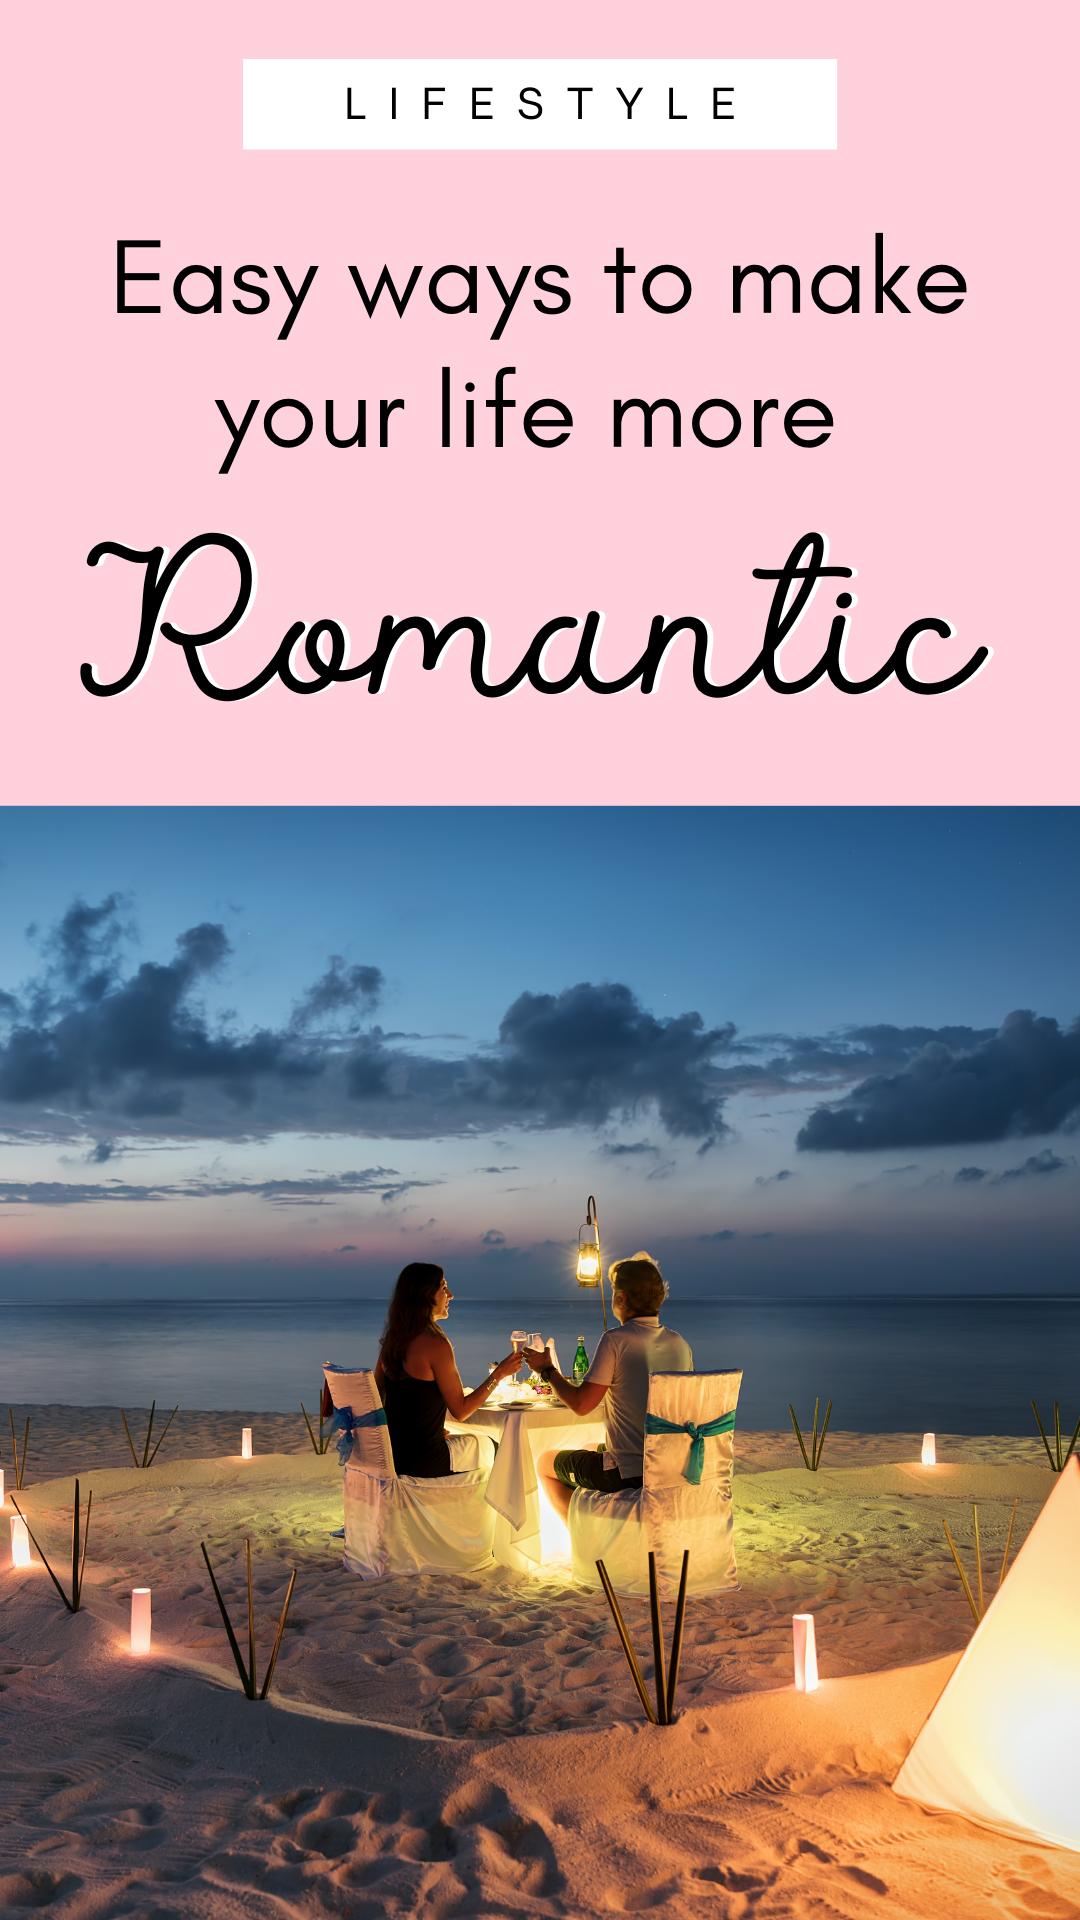 Romantic Living: Easy ways to romanticize your life.